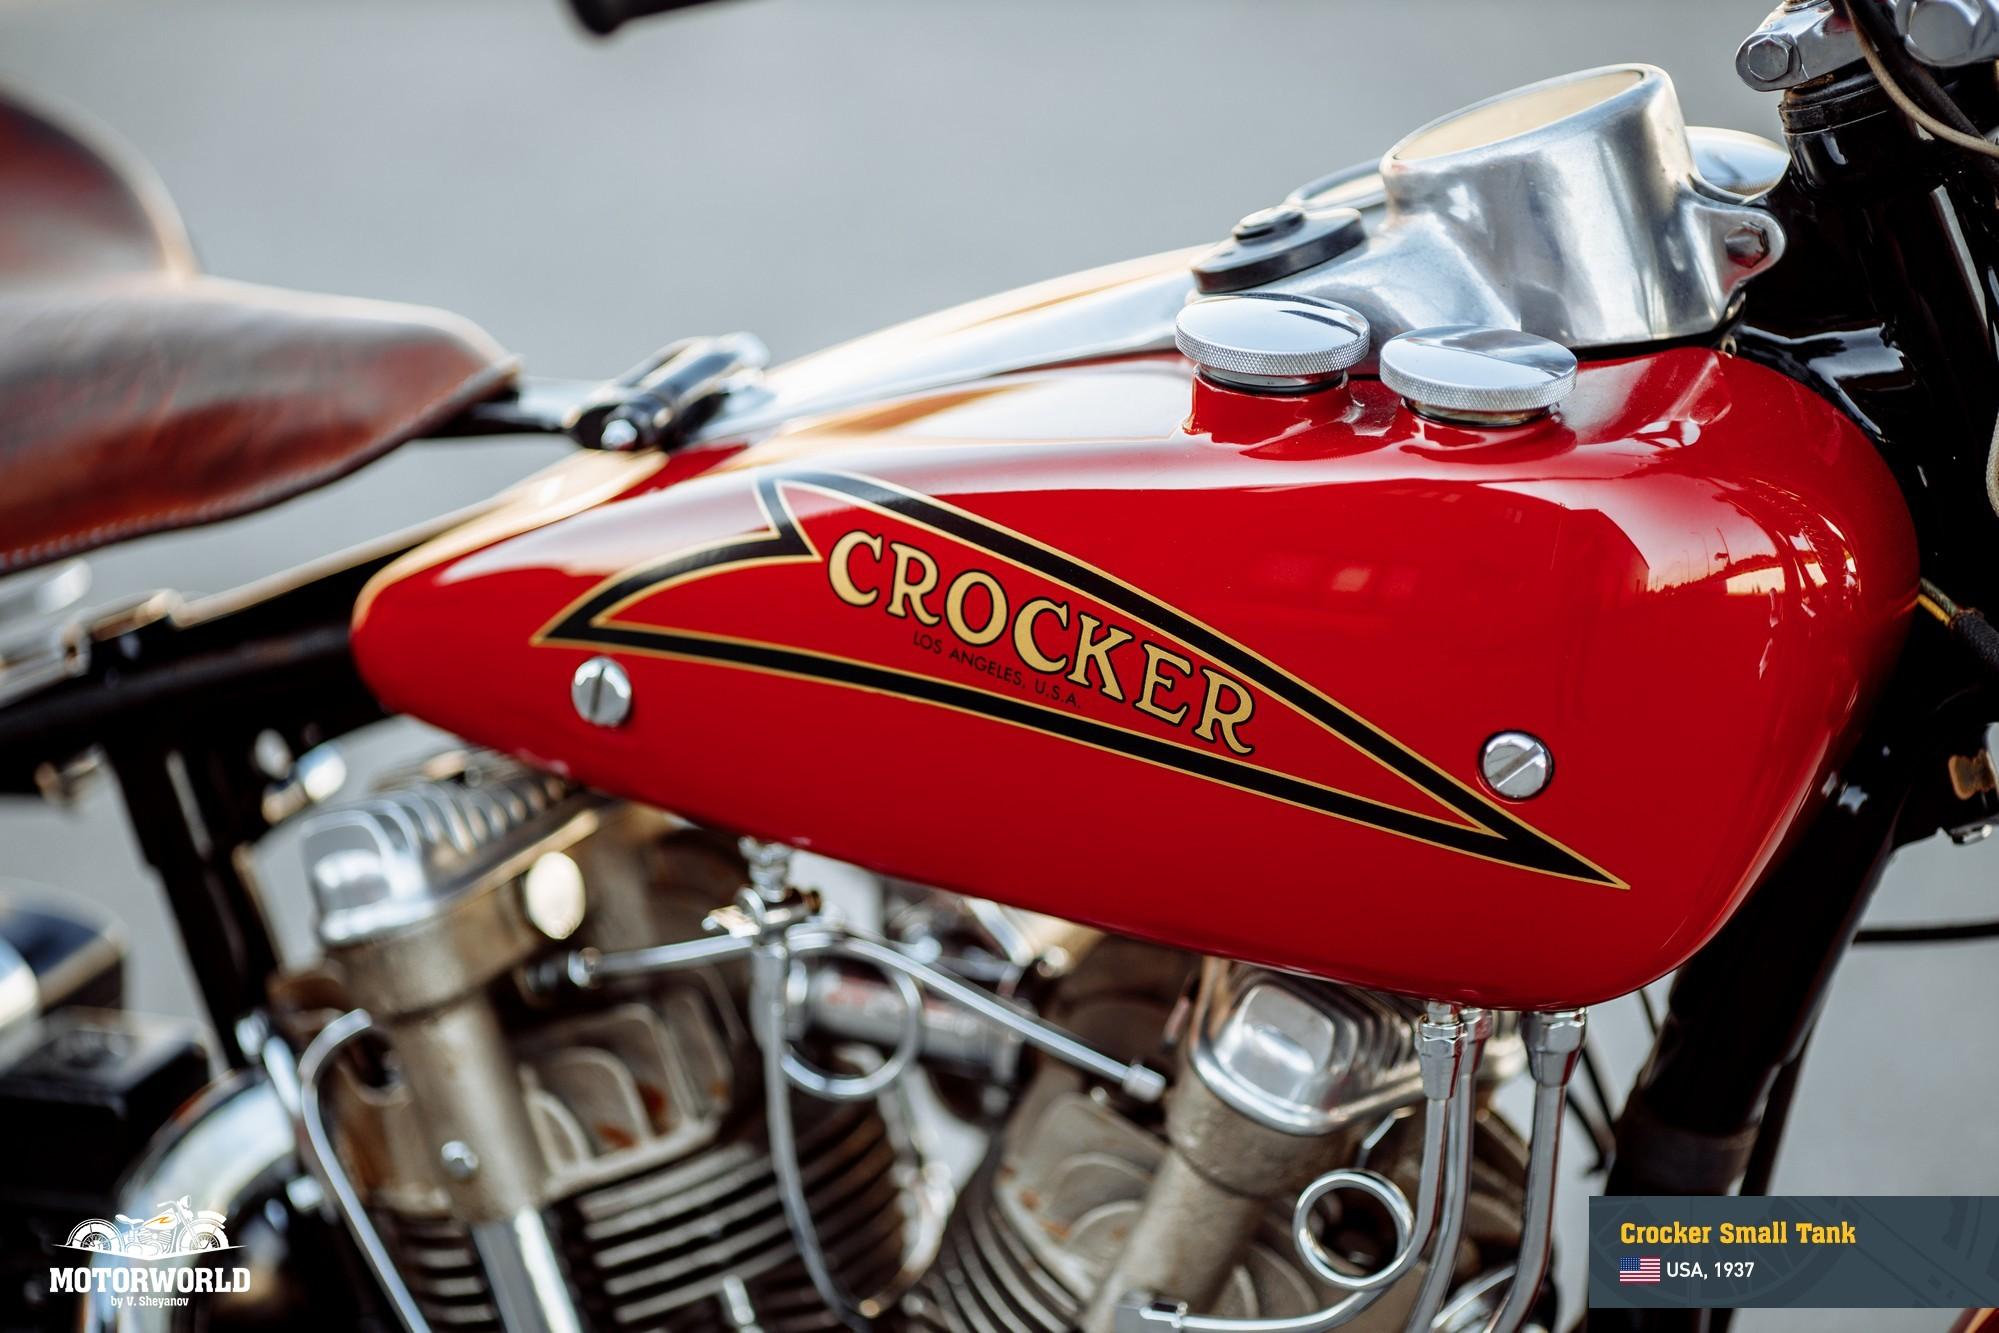 crocker-small-tank-web-eng-02